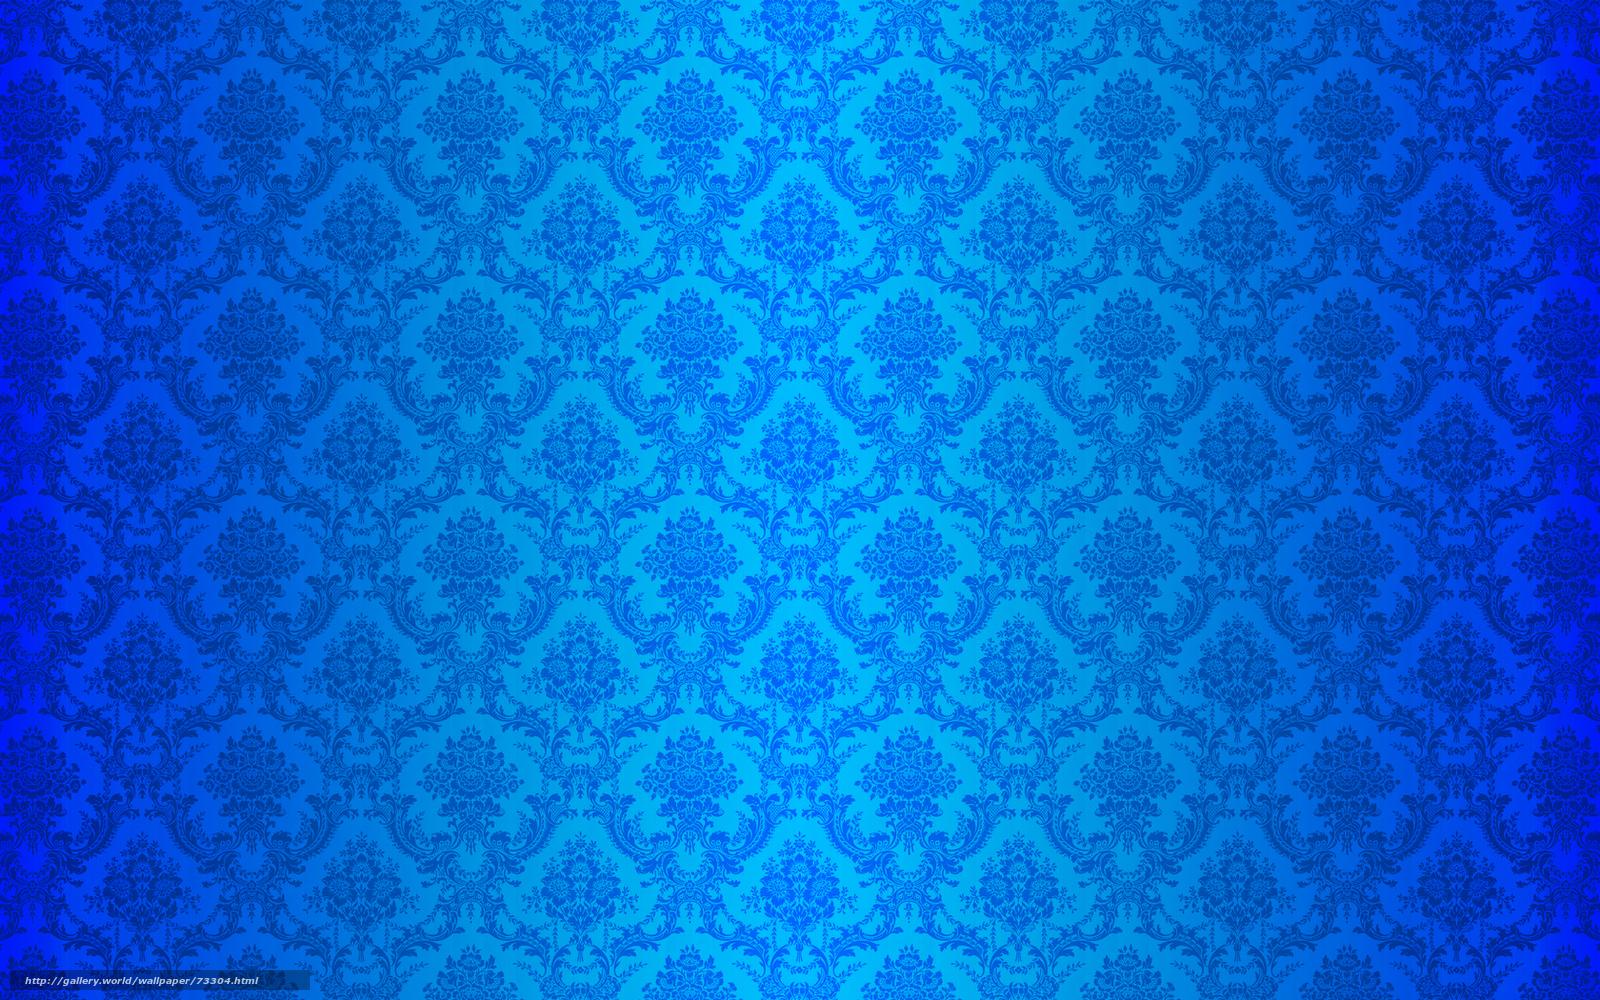 Tlcharger fond d 39 ecran textures papier peint bleu for Papier peint ecran